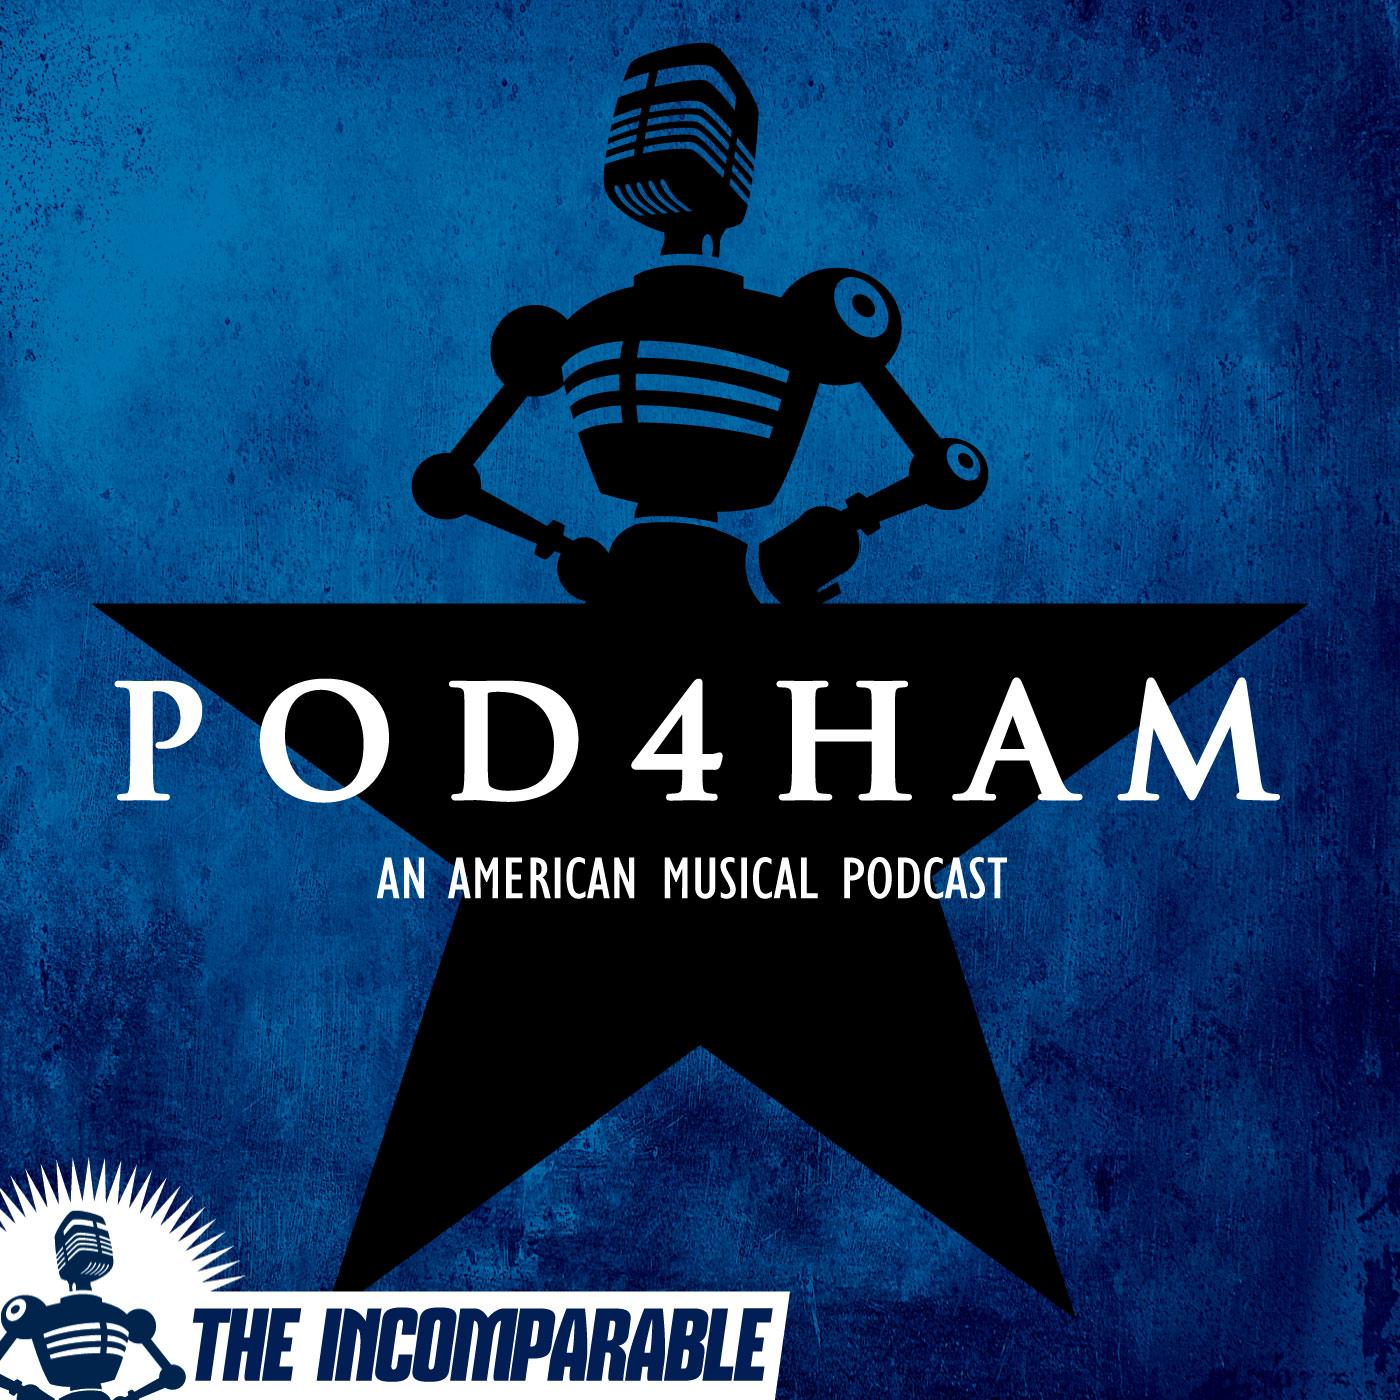 Pod4Ham - a podcast about the musical Hamilton